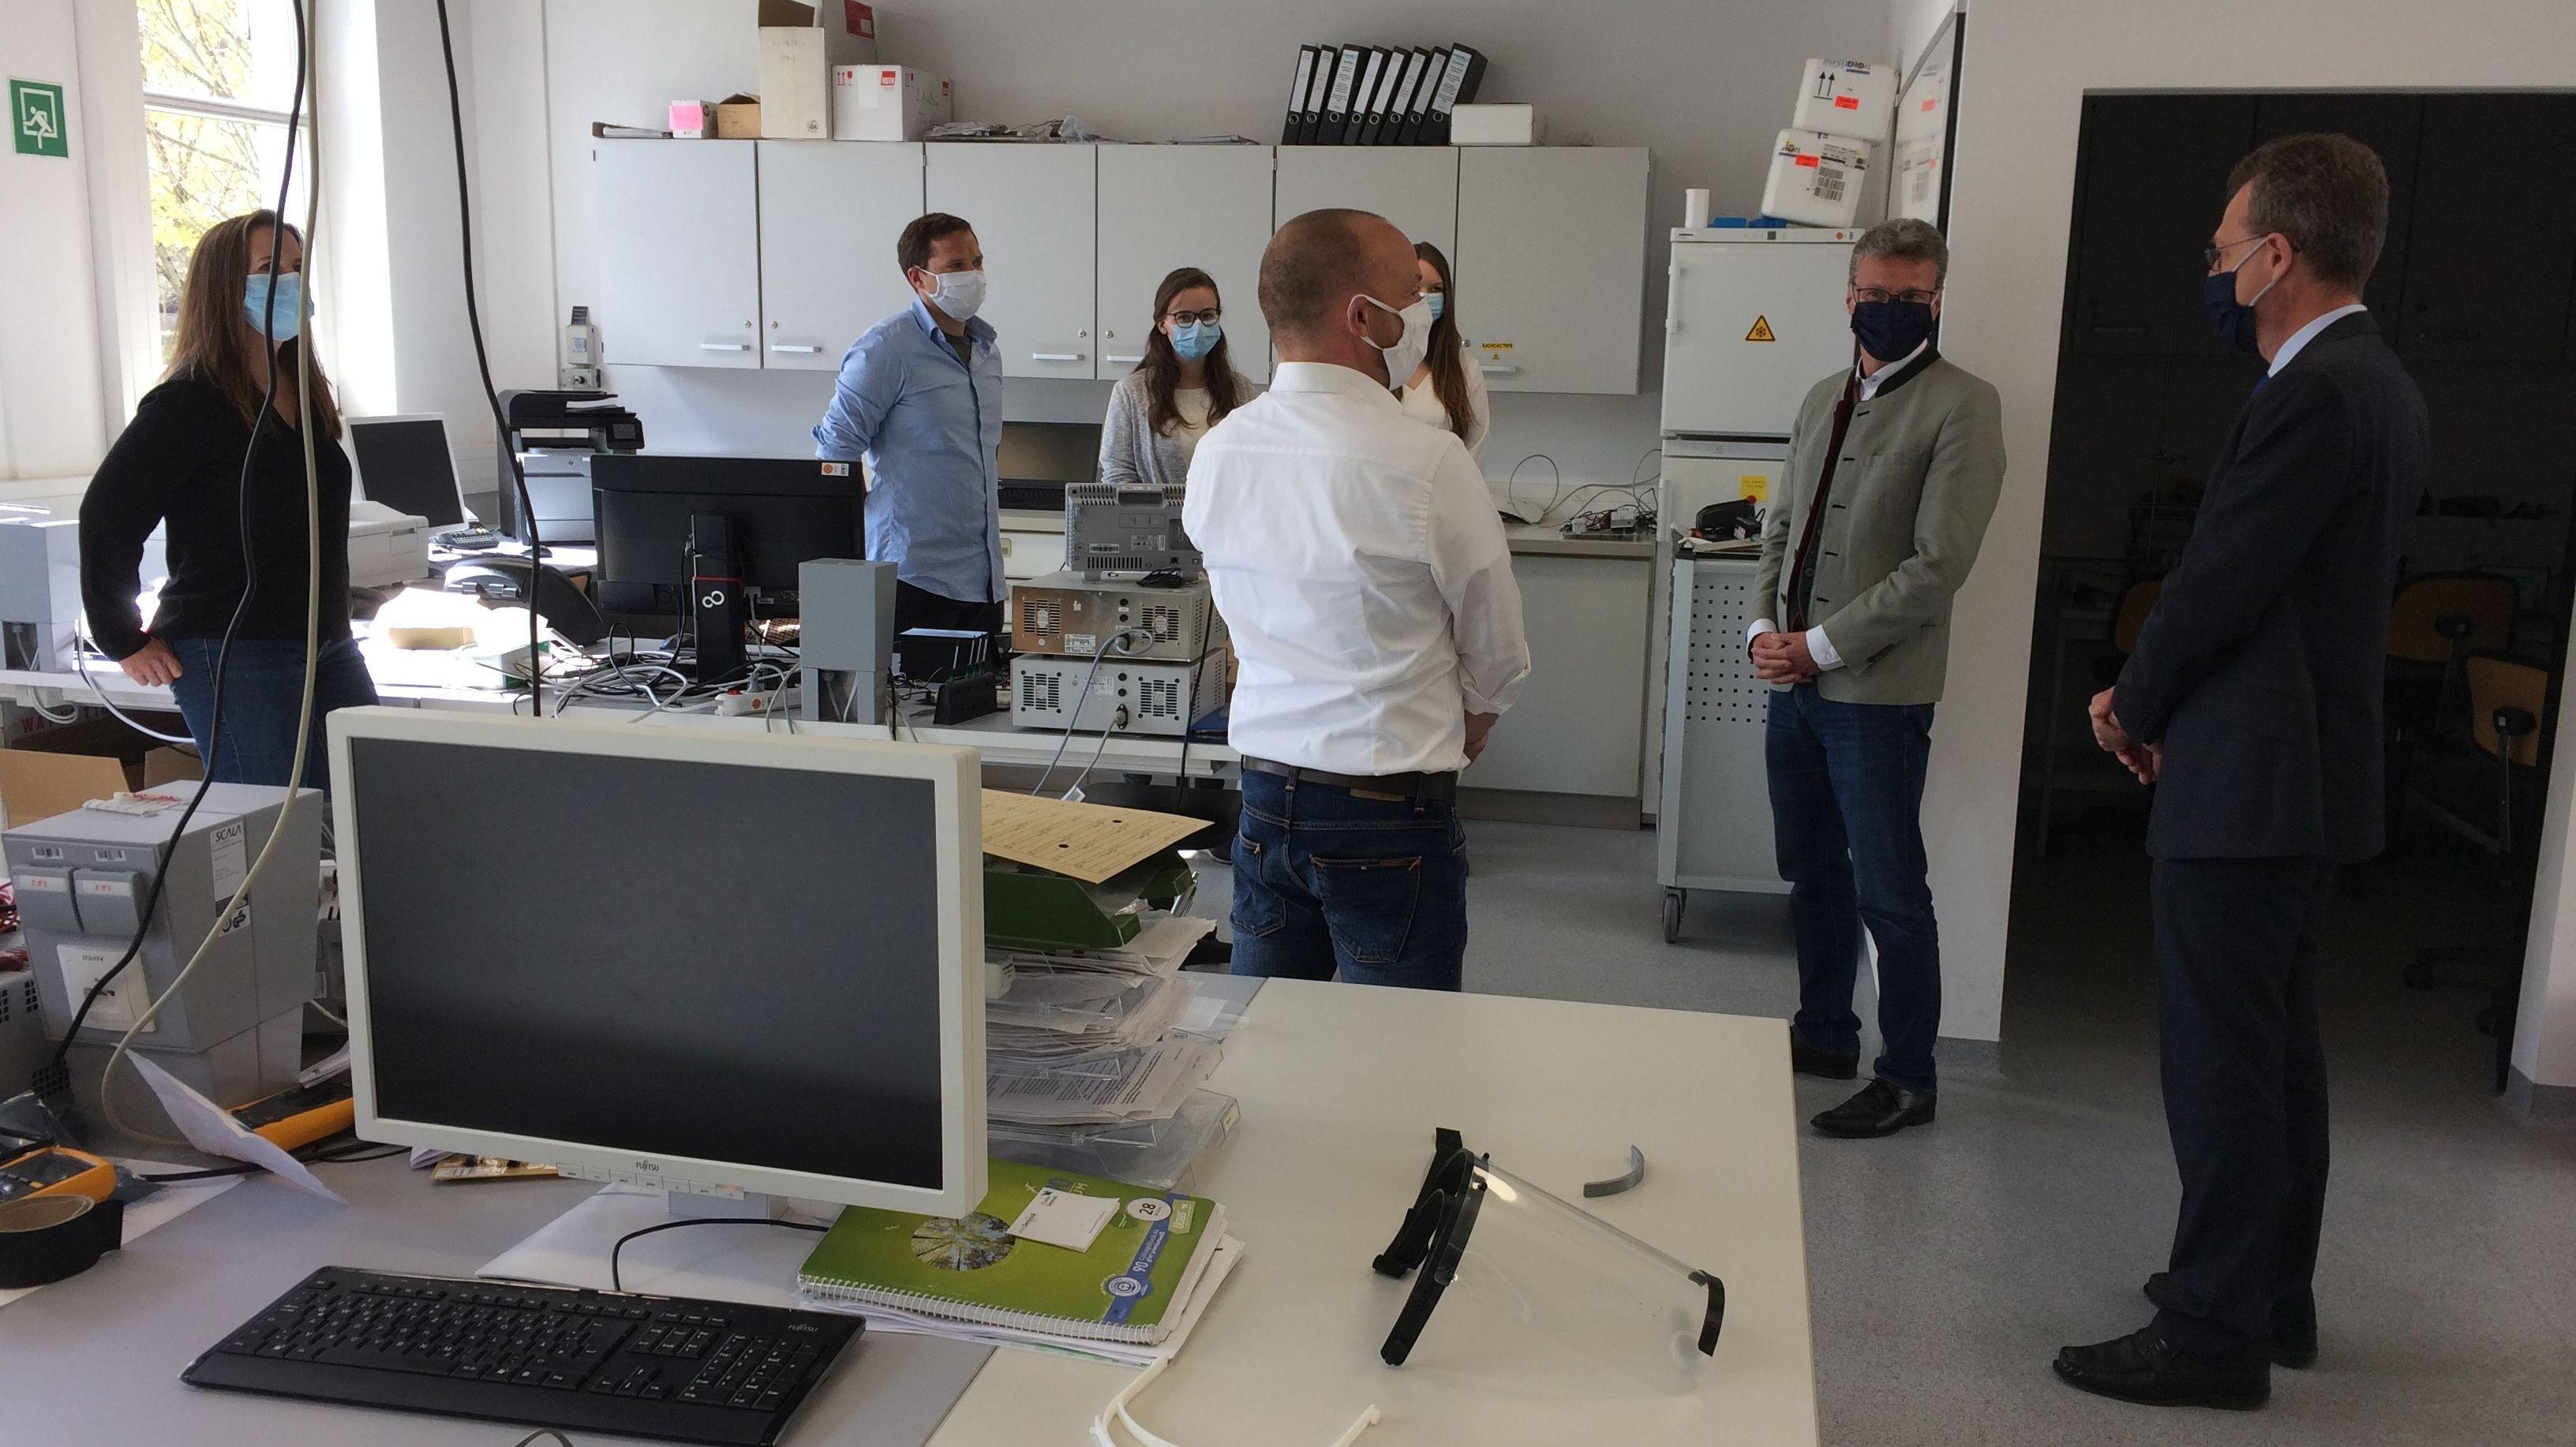 Wissenschaftsminister Bernd Sibler (CSU) war an der HAW Landshut zu Gast